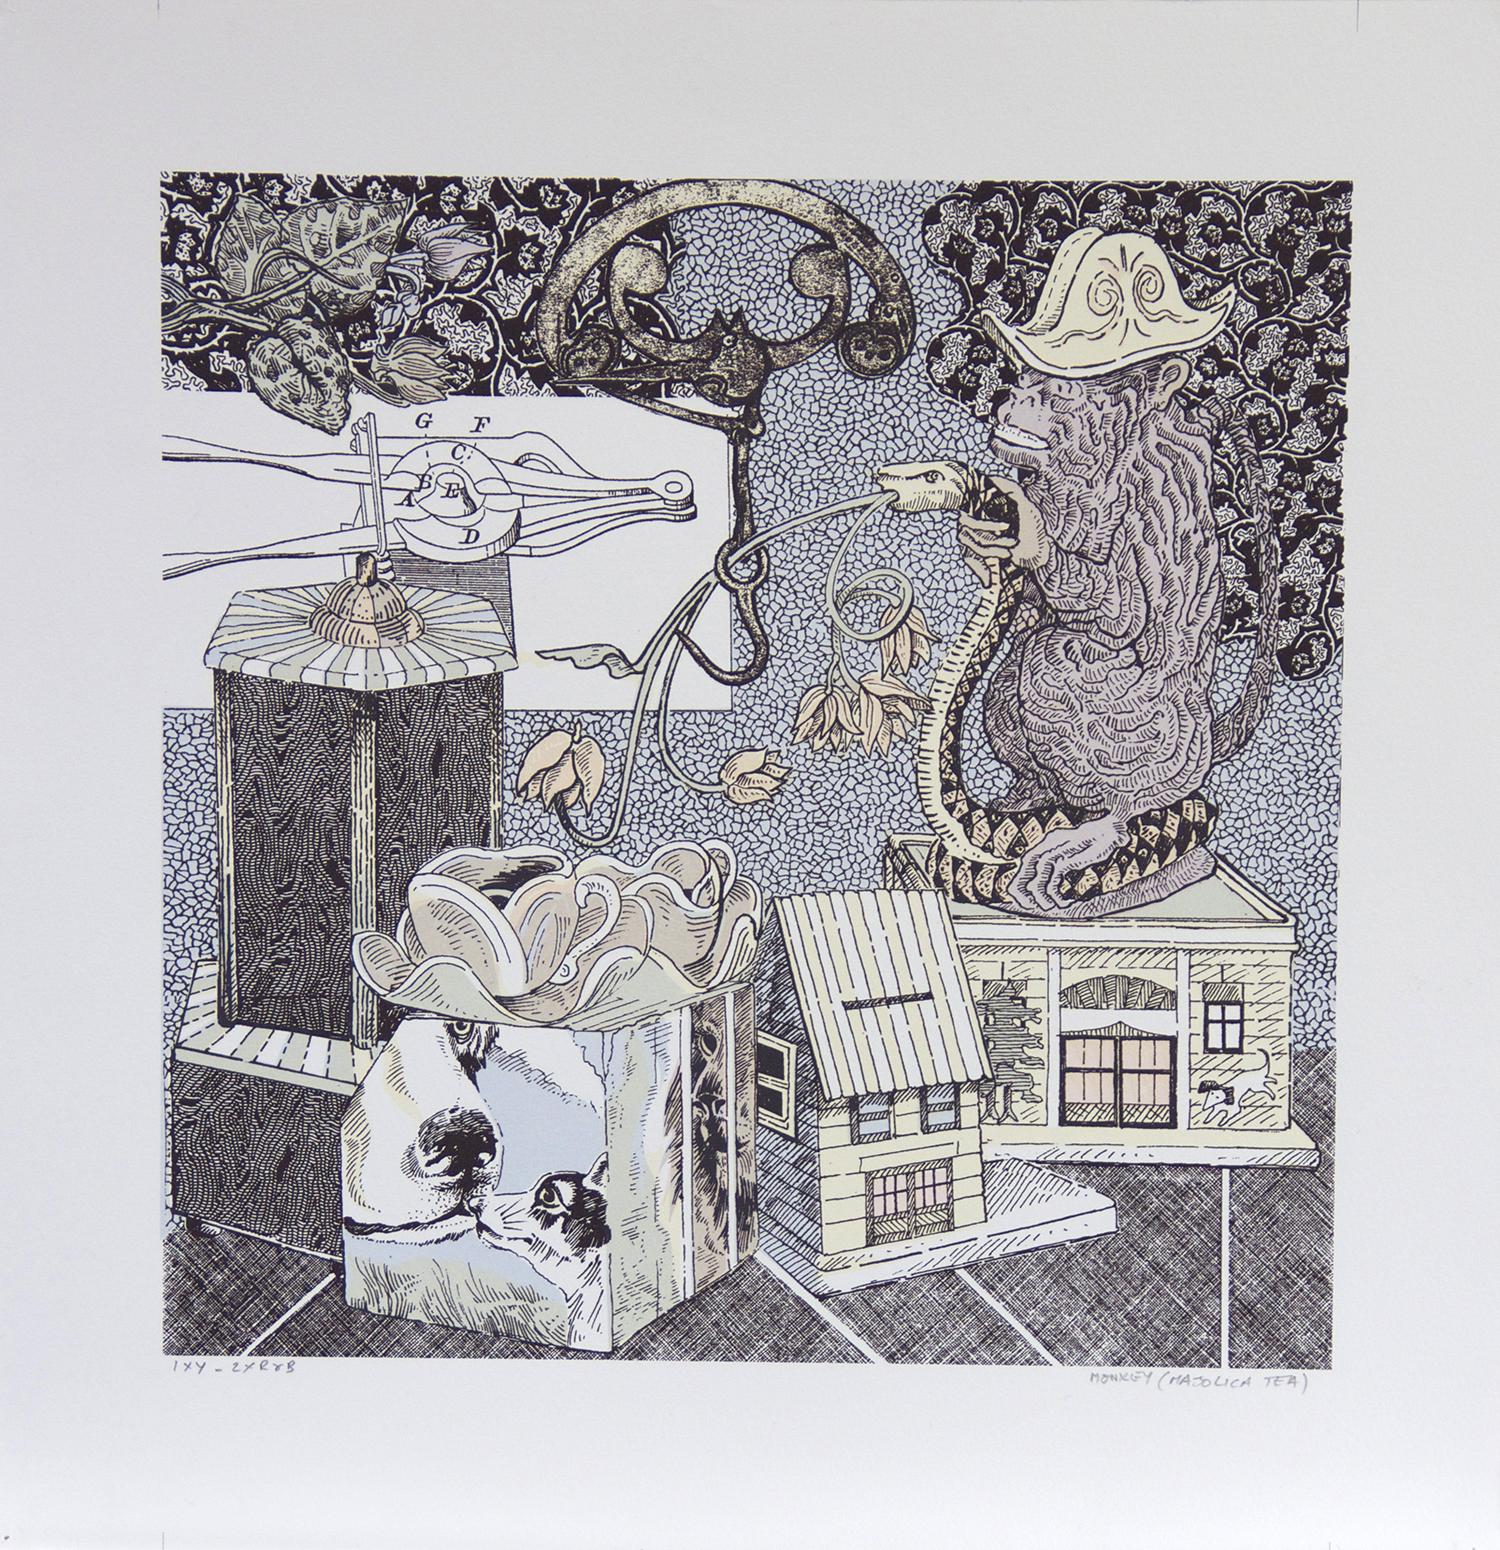 Ellen Lanyon, Curiosities,Monkey    Date: 2014  Size (cm - unframed): 47 x 46  Technique: Screenprint  Materials:  Somerset Velvet 300 gsm   Edition size: 4  Publisher:  The Artist/ The Print Studio  Copyright: The Artist   P.O.A